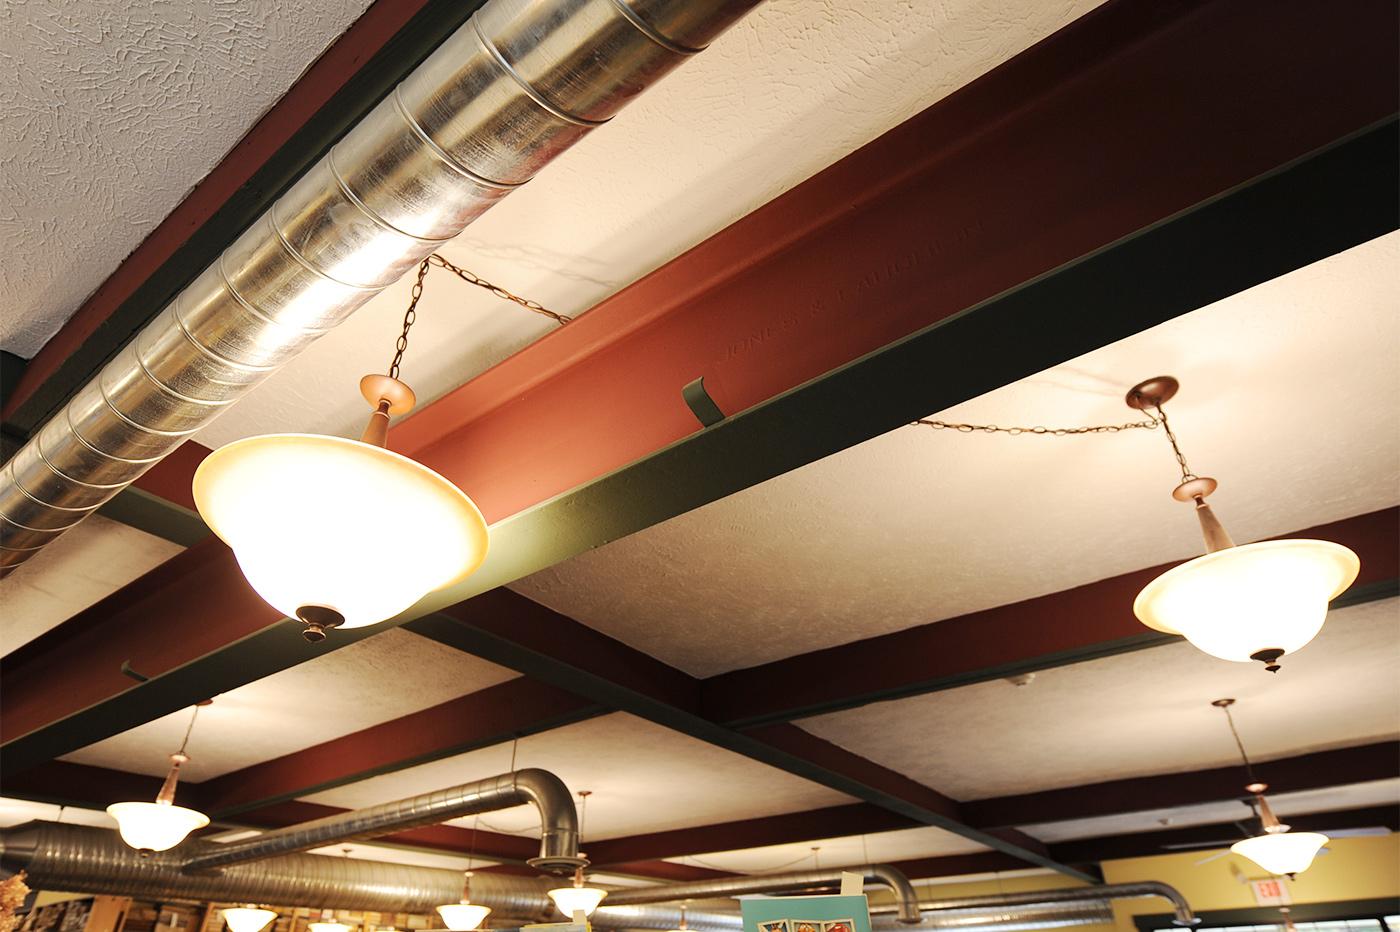 ceilingdetail-1